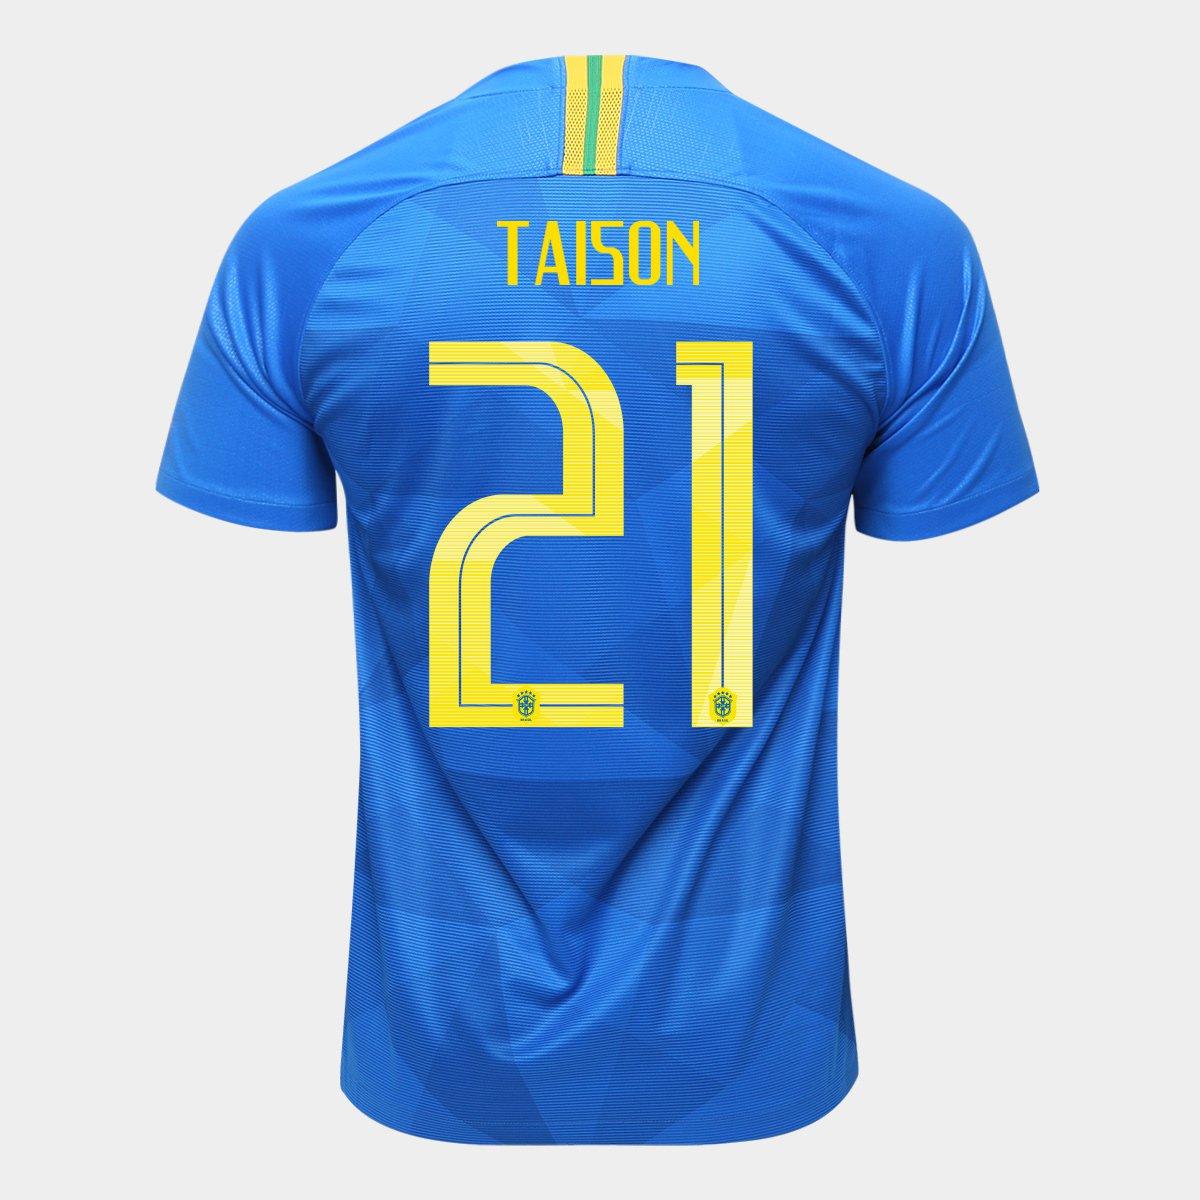 34c37ab9ea377 Camisa Seleção Brasil II 2018 nº 21 Taison - Torcedor Nike Masculina - Azul  - Compre Agora